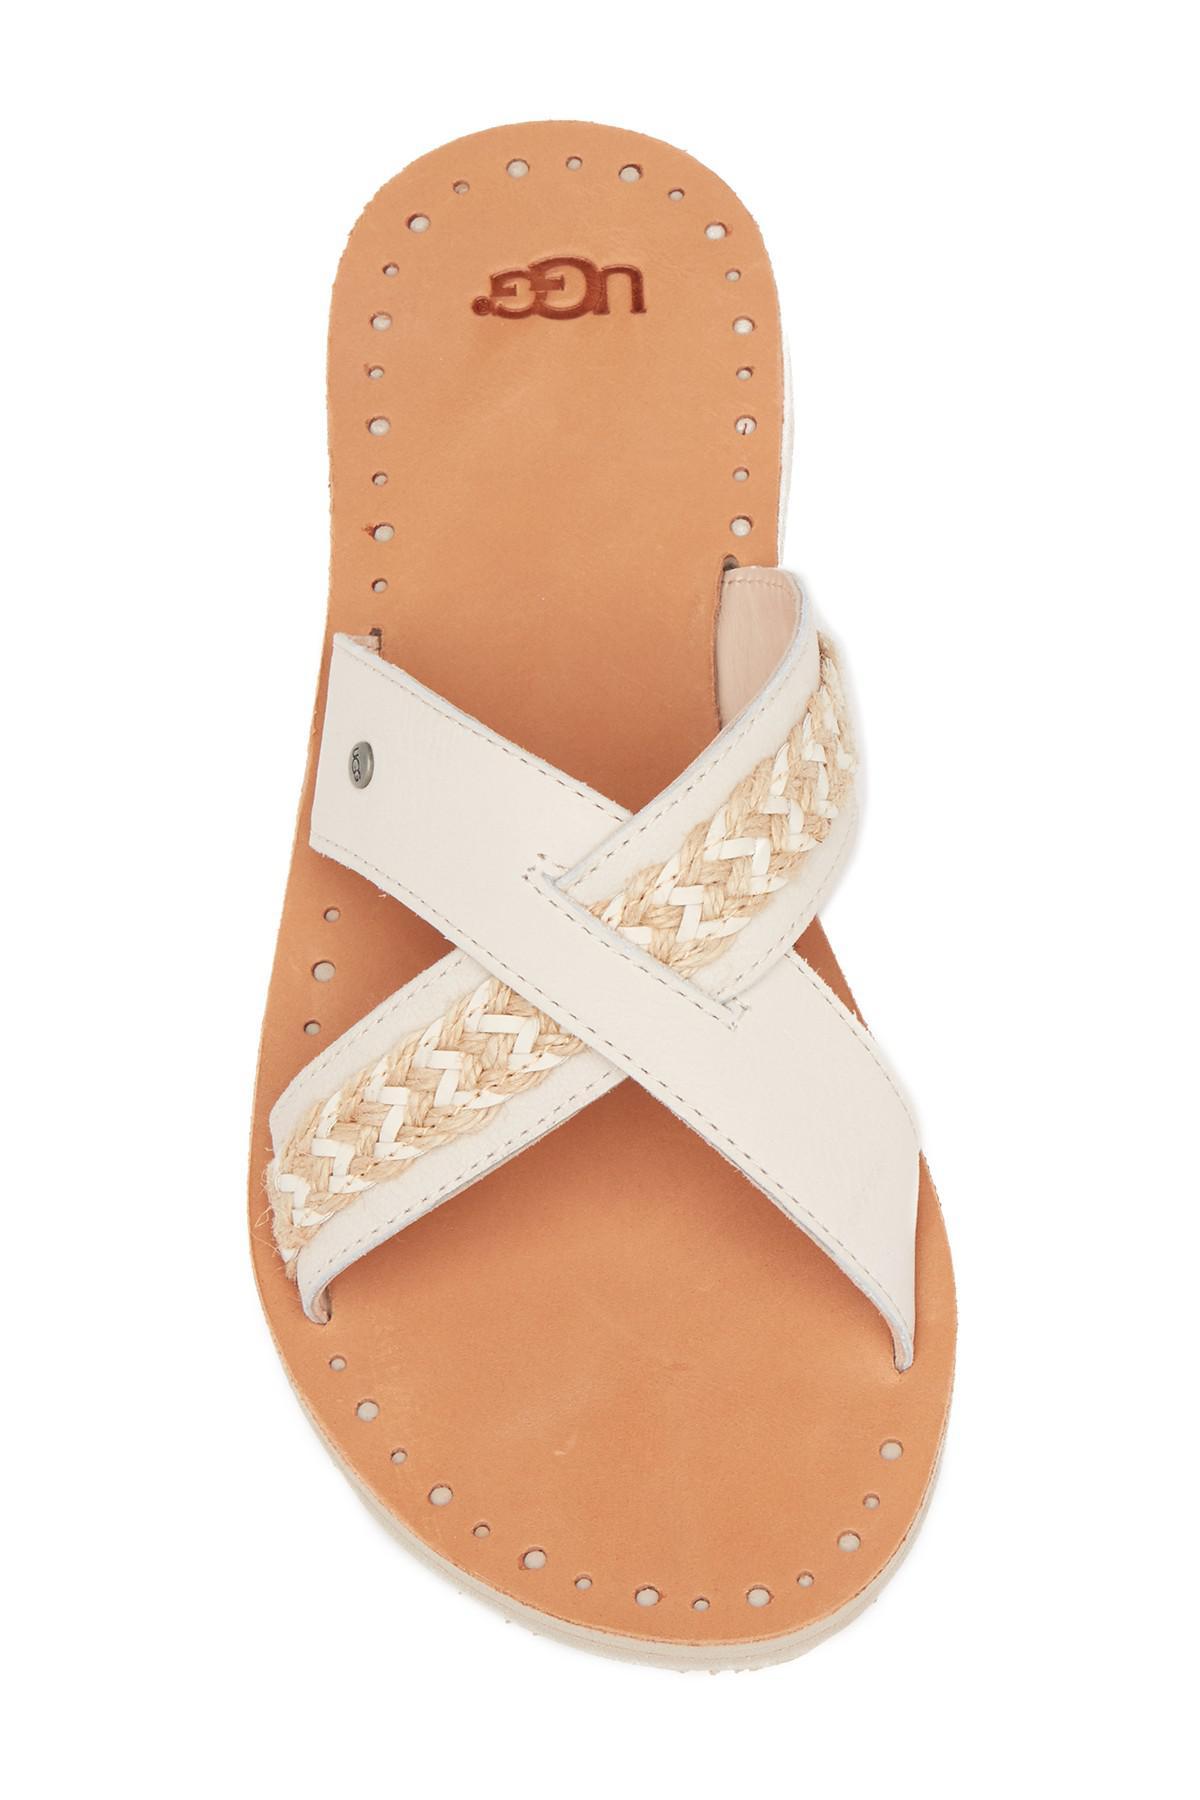 95543559dd3 Lyst - UGG Lexia Crisscross Sandal